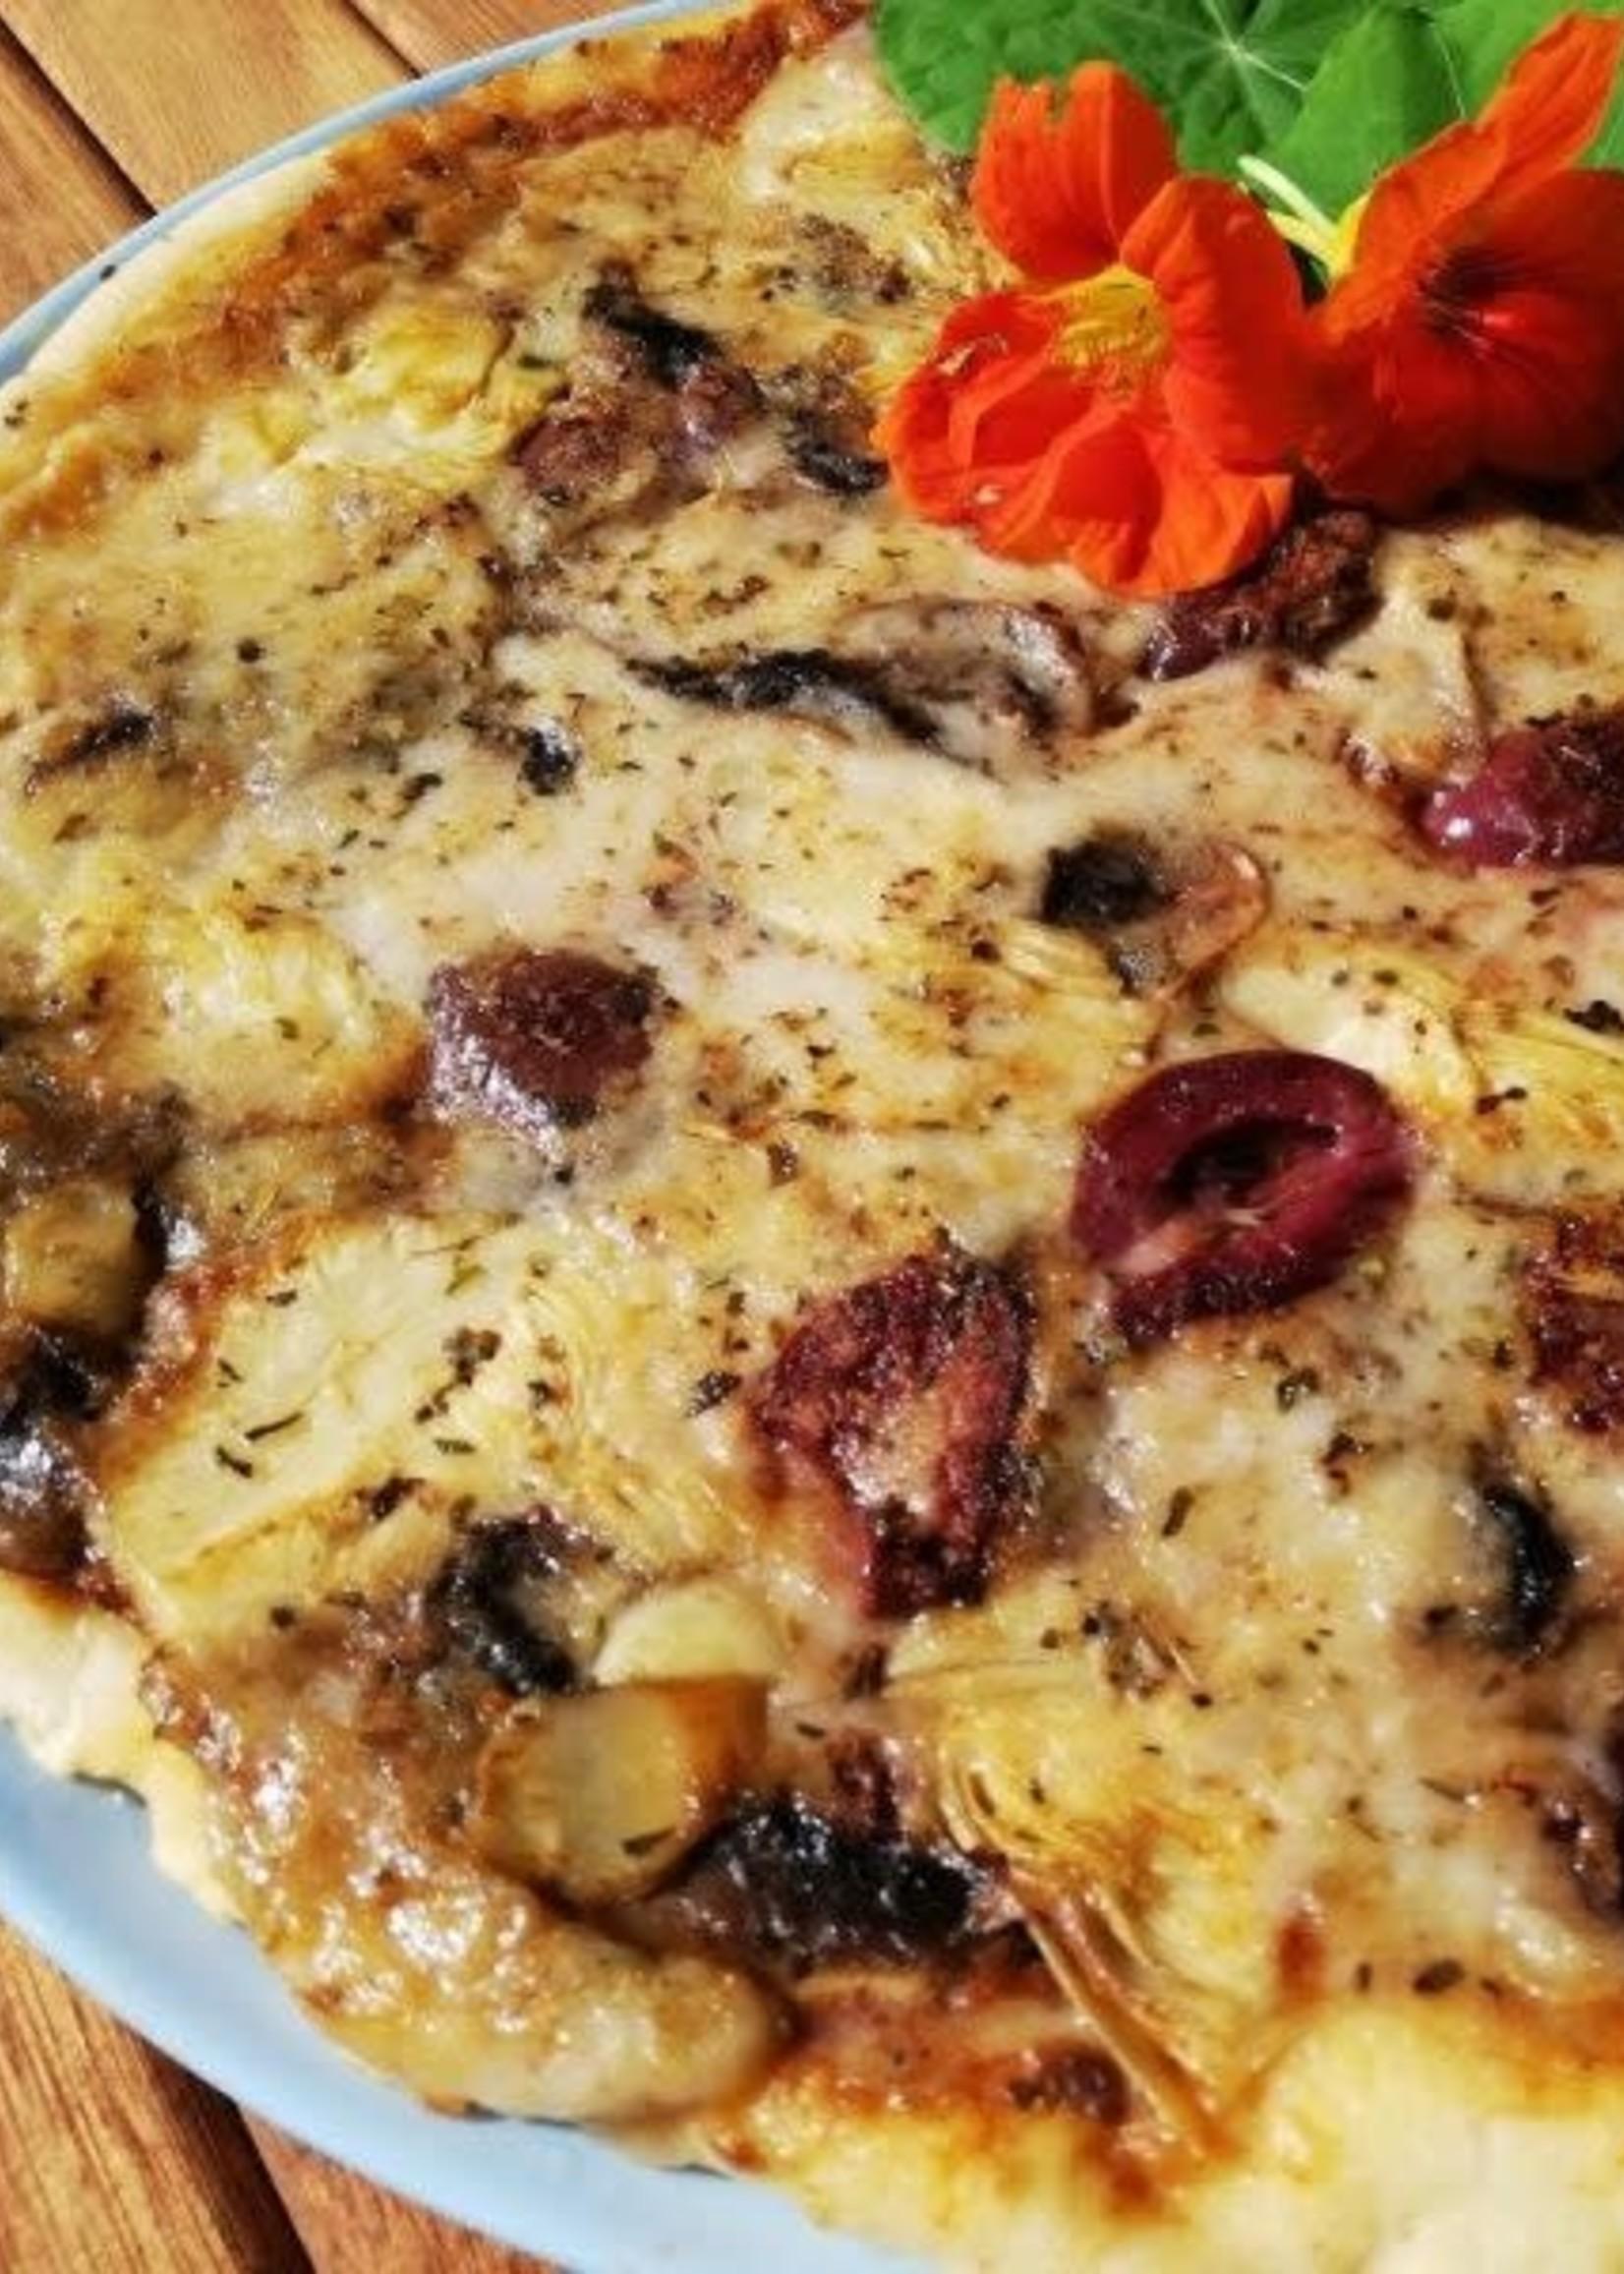 Irene's Irene's - GF Artichoke, olive & mushroom pizza